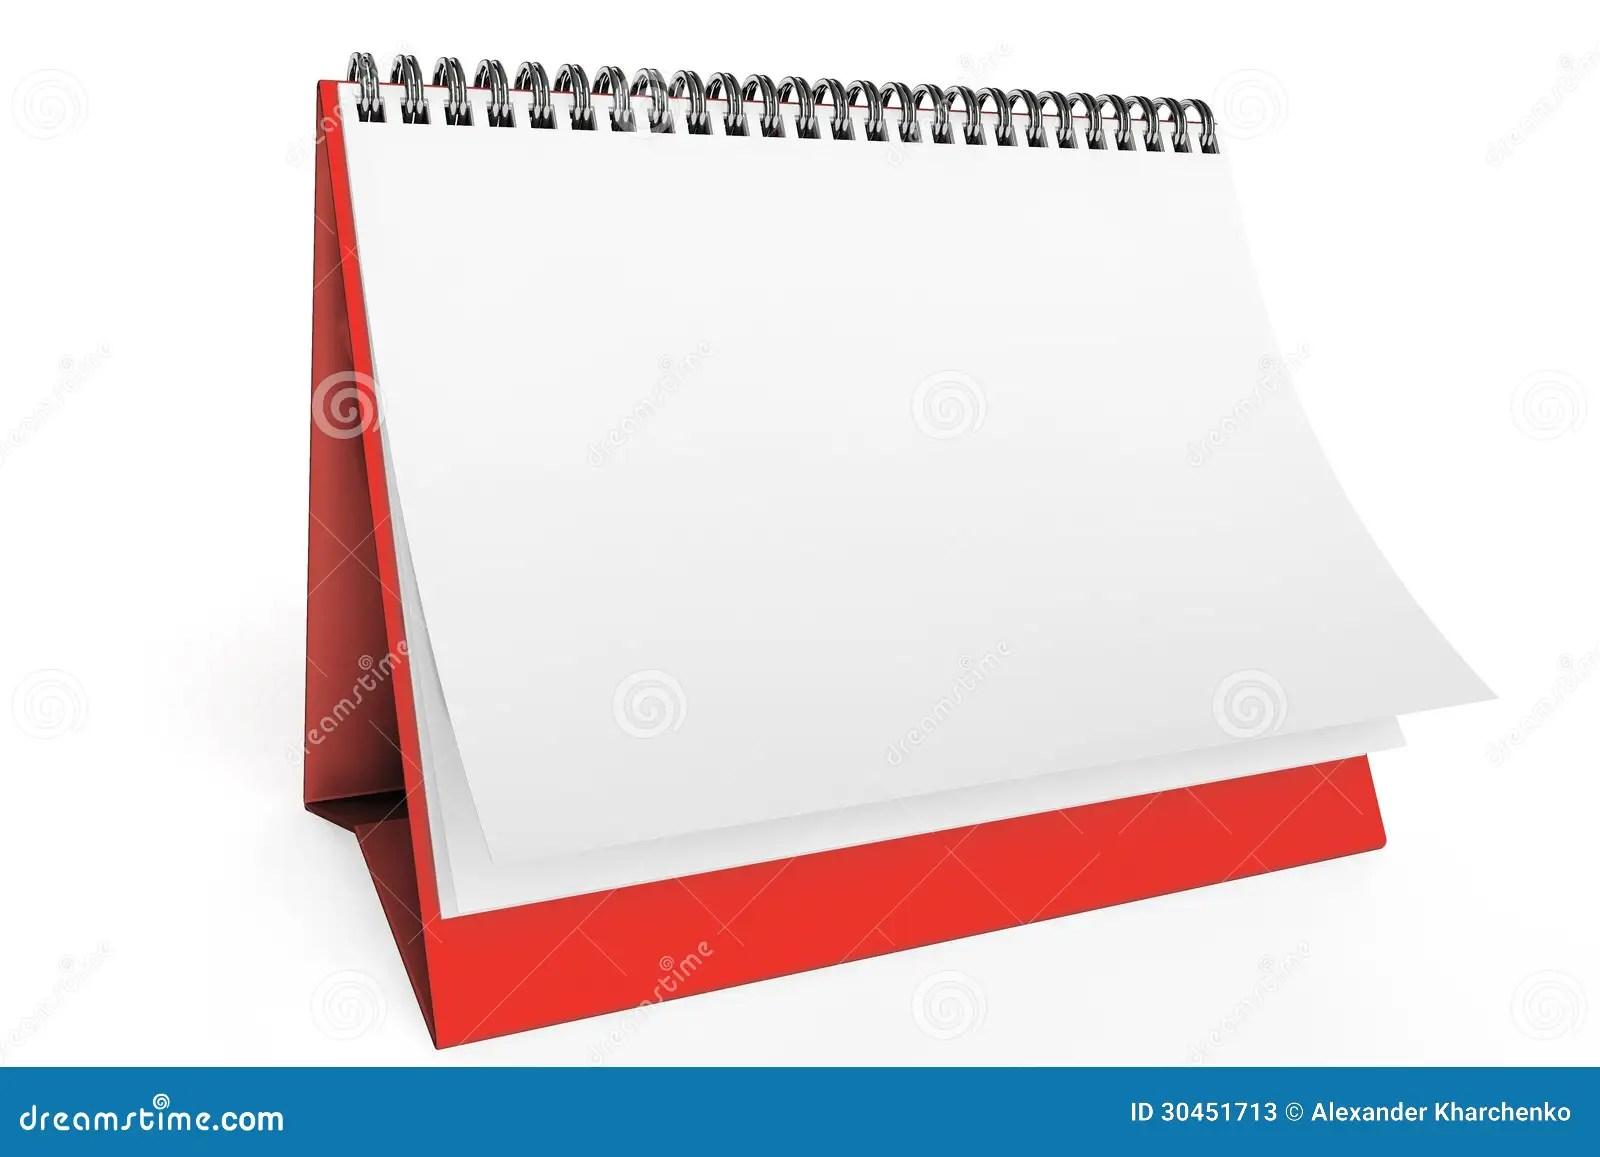 Week Year Calendar Clip Daily Calendar Notebook 111=1 Desk Blank Calendar Stock Photos Image 30451713